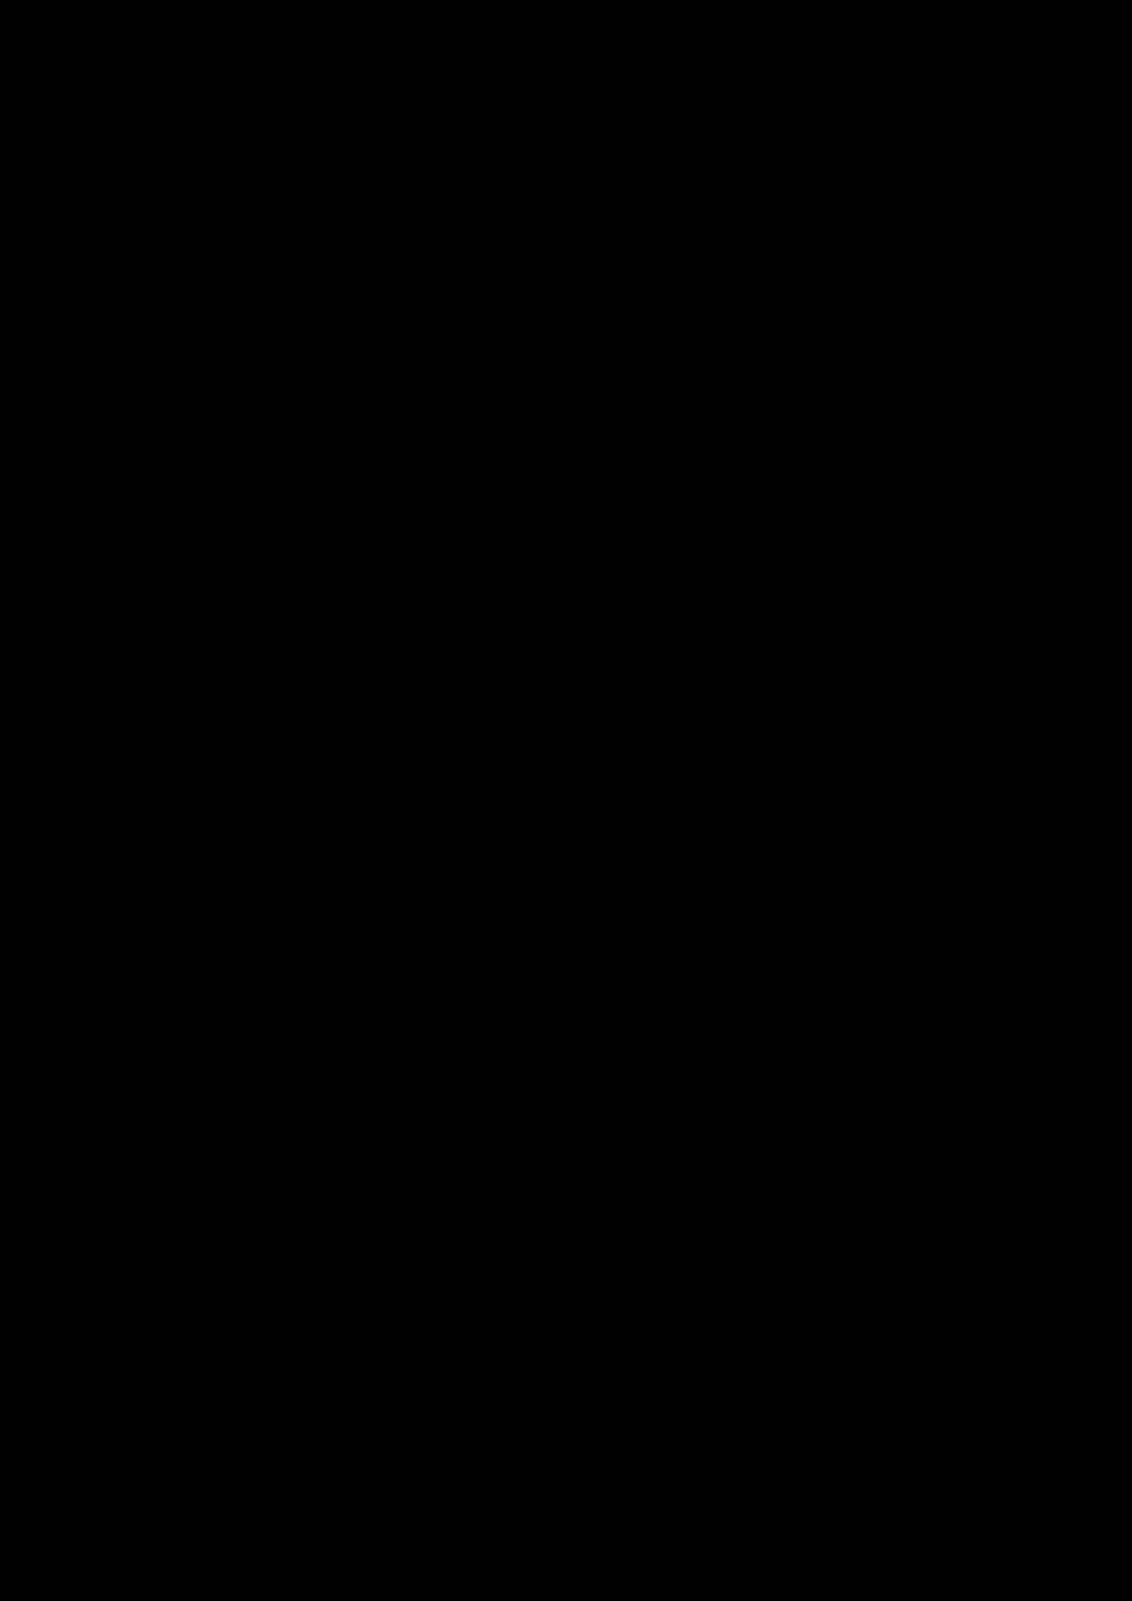 Ispoved Pervogo Boga slide, Image 59